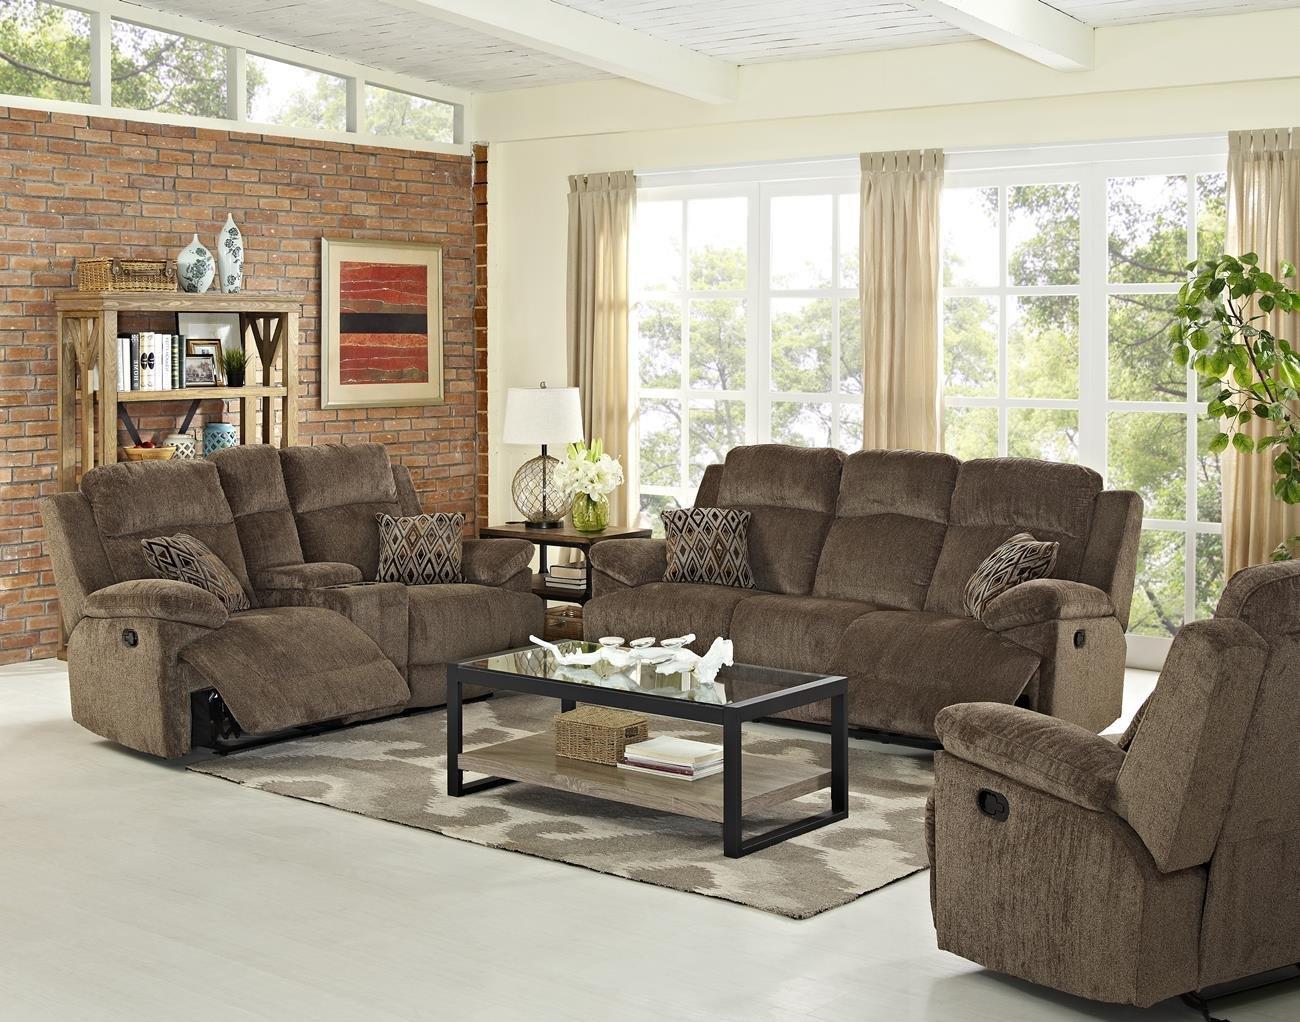 Ryland Dual Power Motion Recliner Sofa U0026 Loveseat U0026 Chair ...